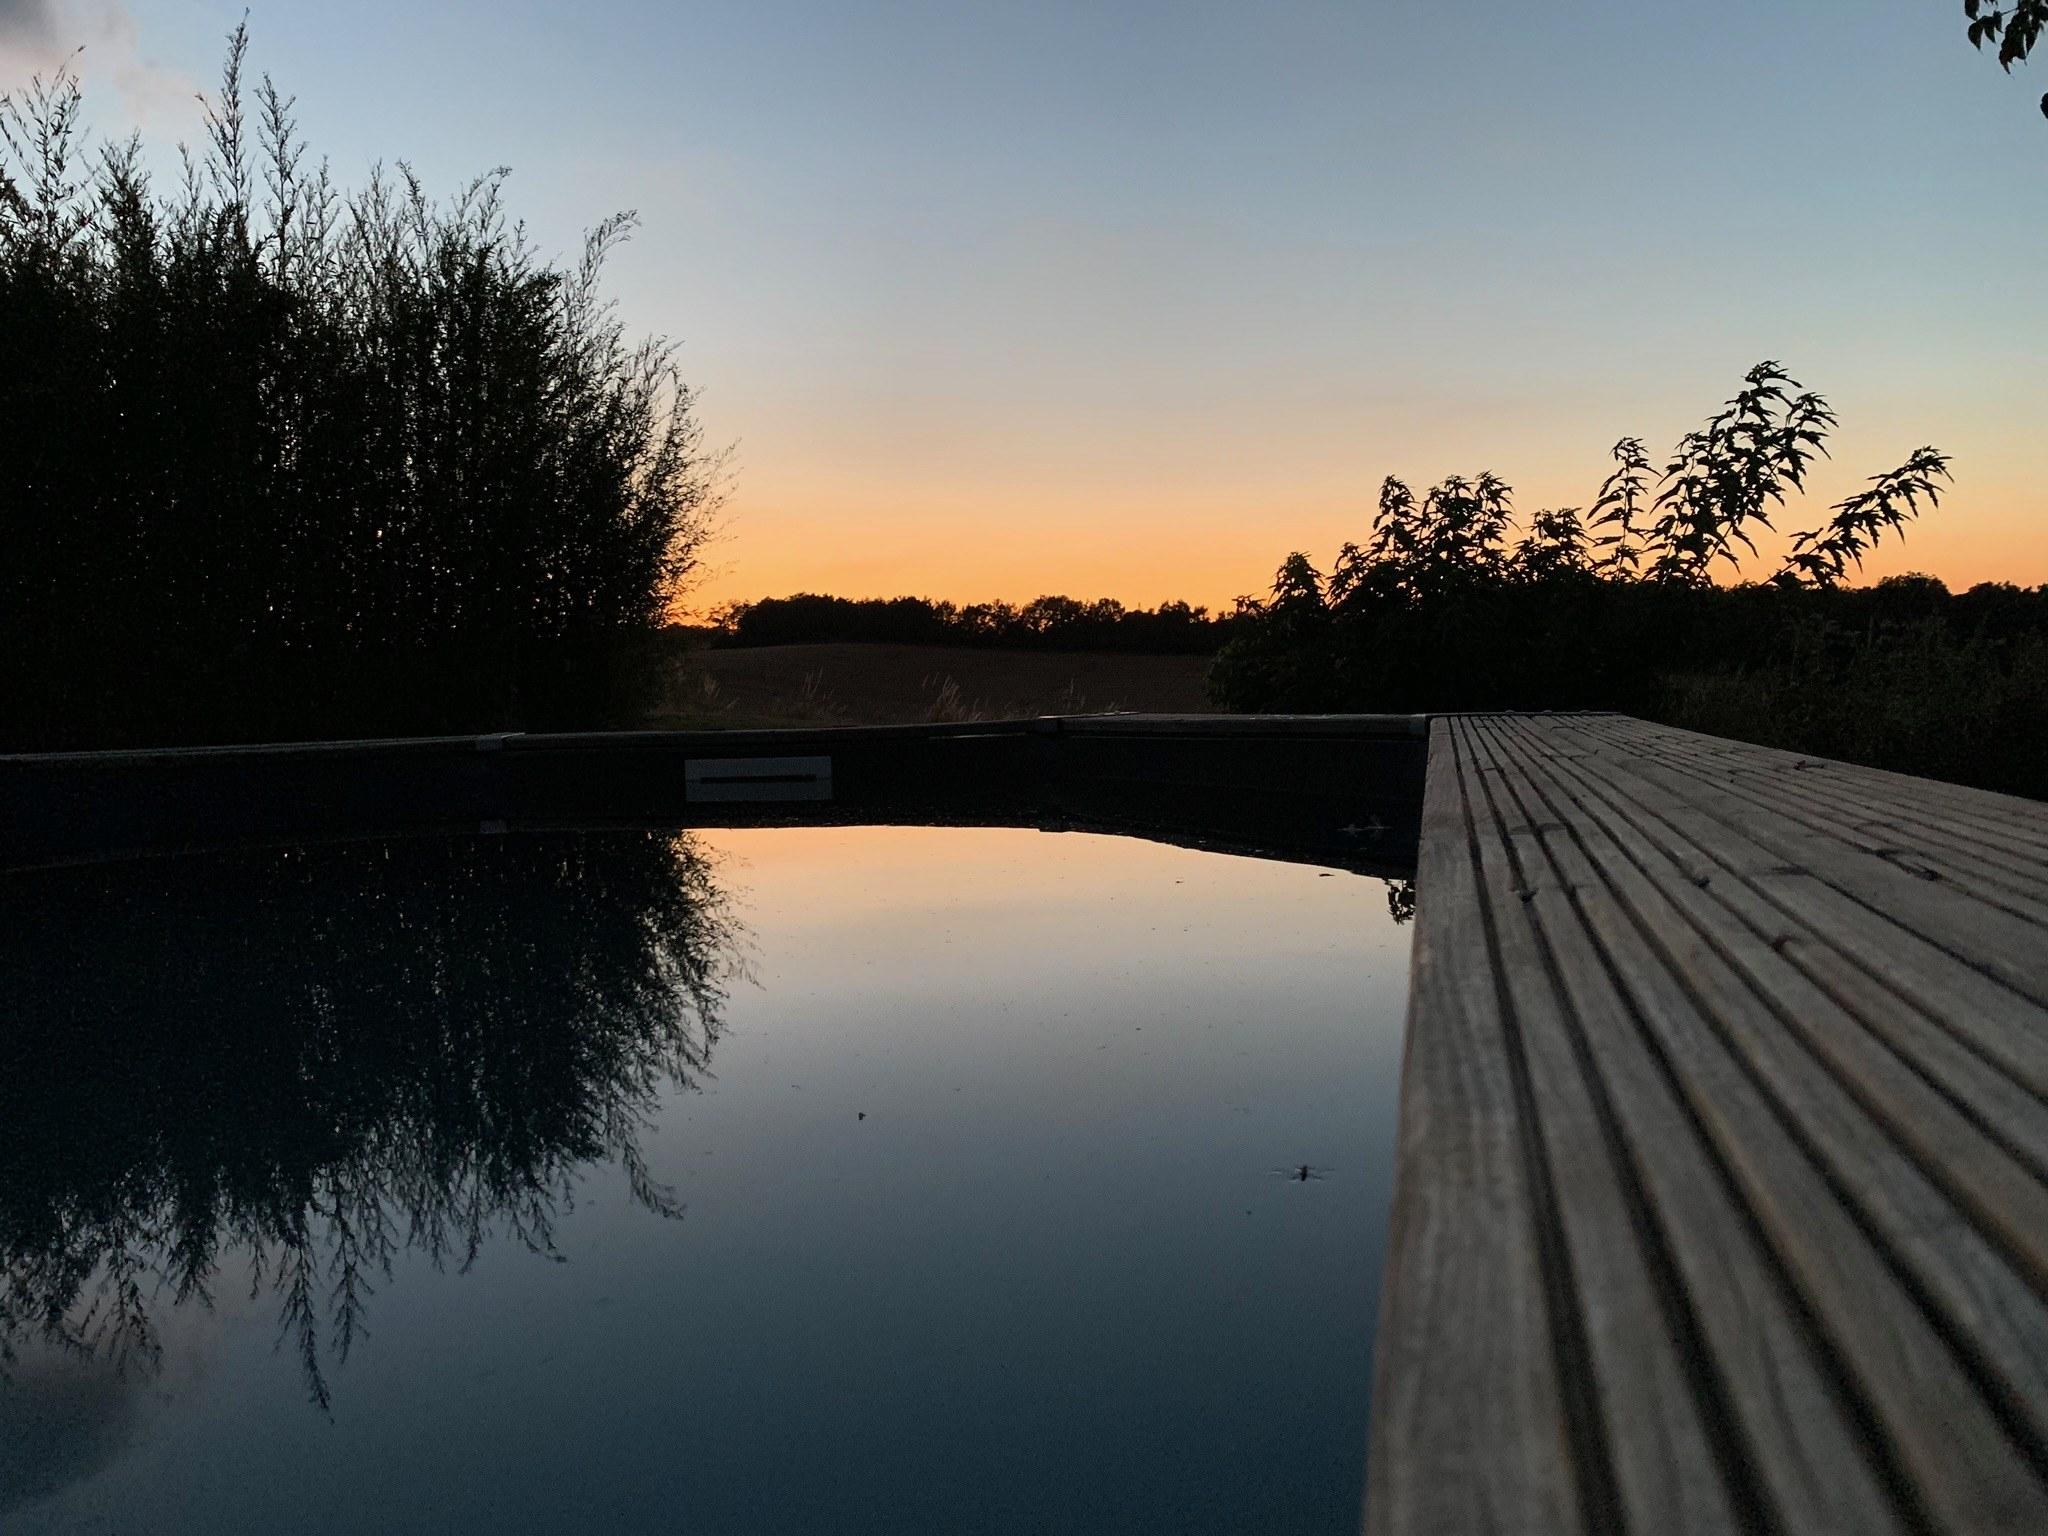 piscine oasis le soir